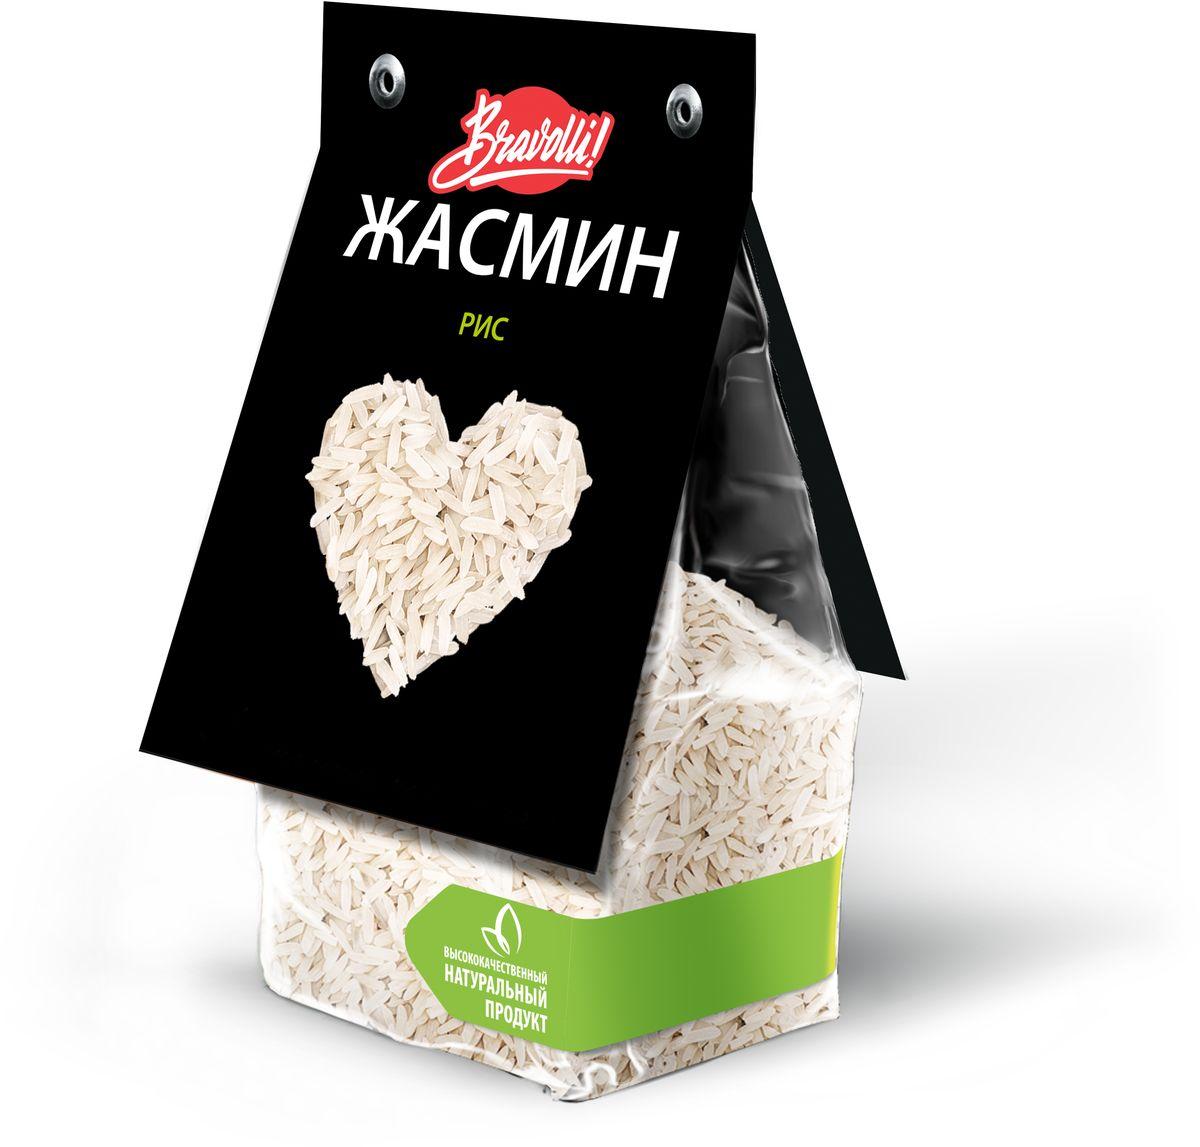 Bravolli Жасмин рис, 350 г bravolli чечевица желтая 350 г